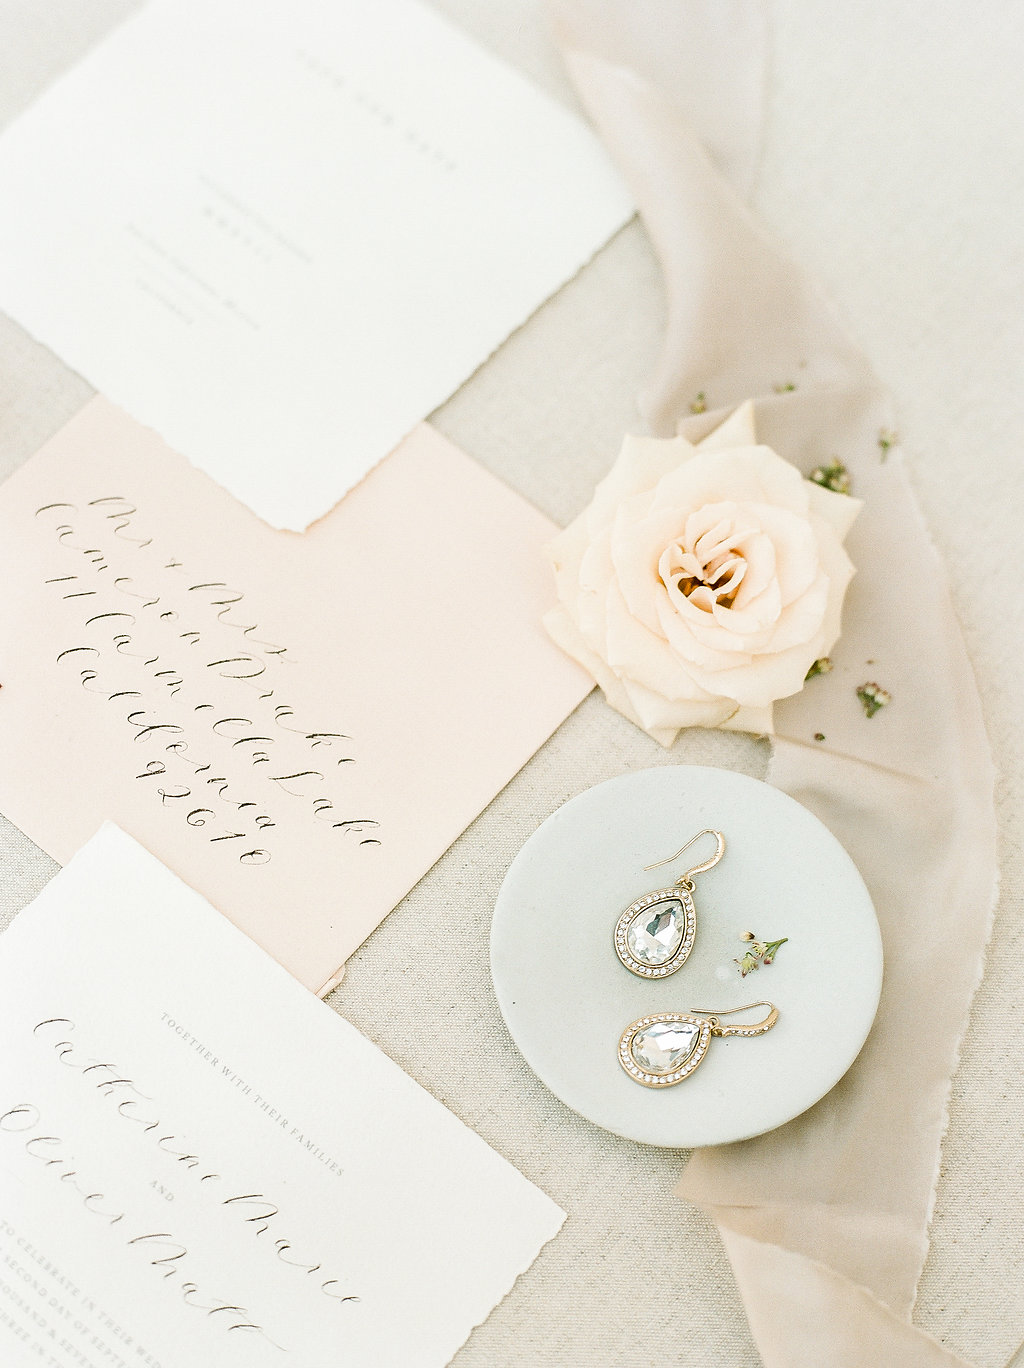 Spanish Mission Style Wedding Ideas Bridal Accessories Summer Flowers Finding Flora Wedding Sparrow Fine Art Flourish Calligraphy Invites Stationery San Juan Capistrano